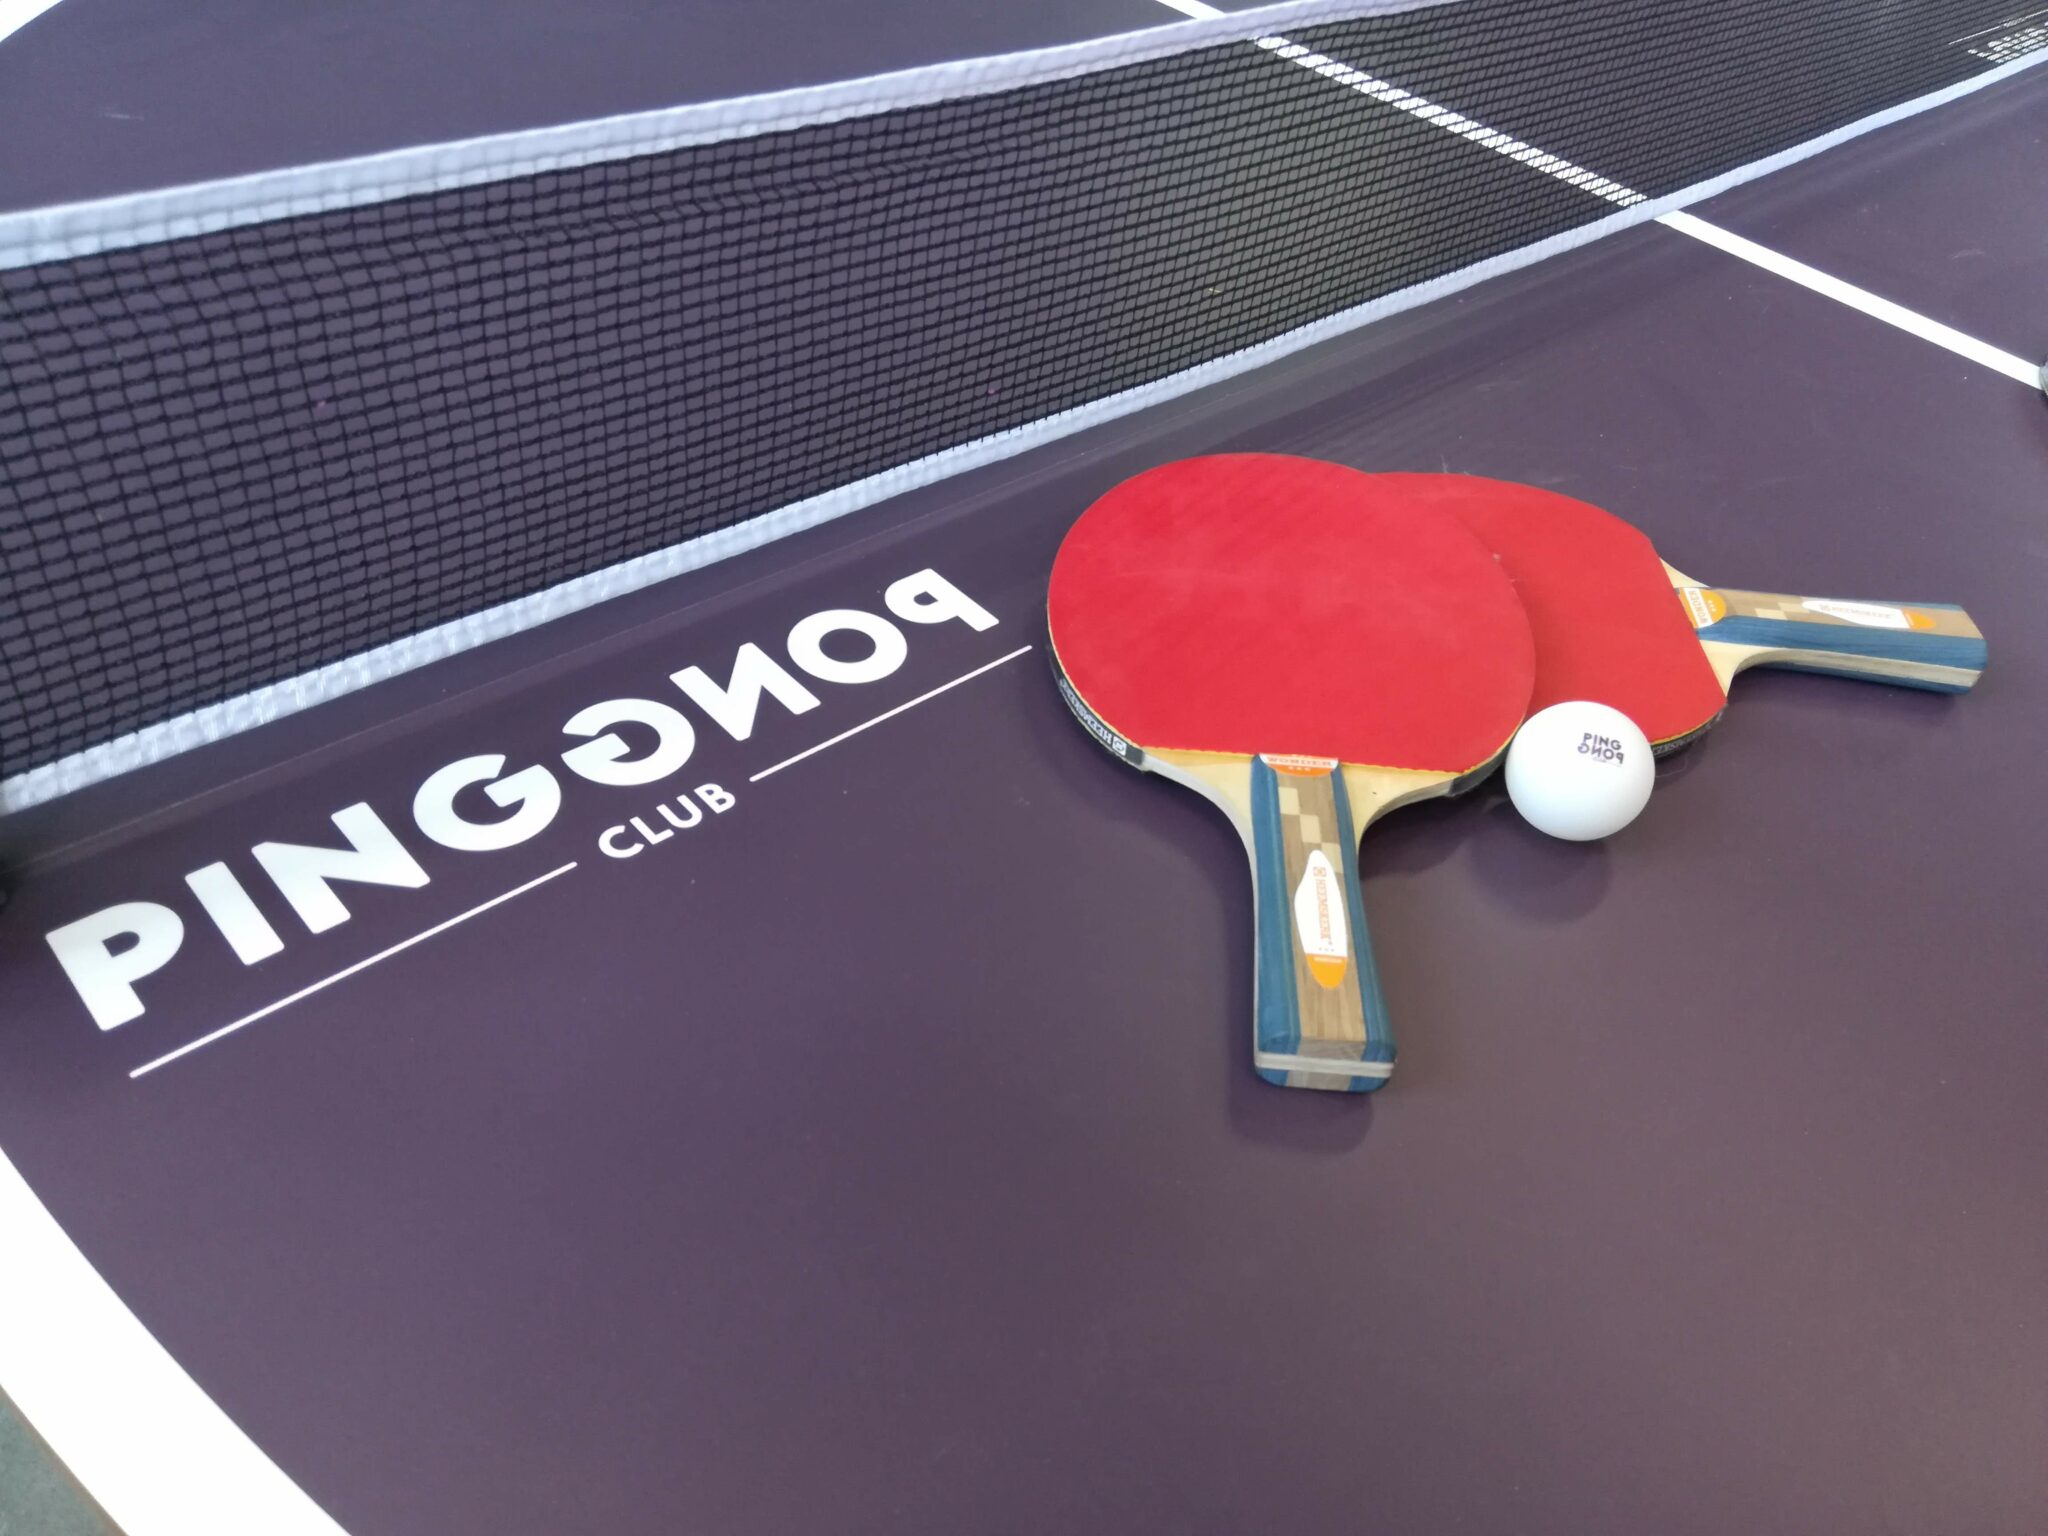 Pingpong club utrecht